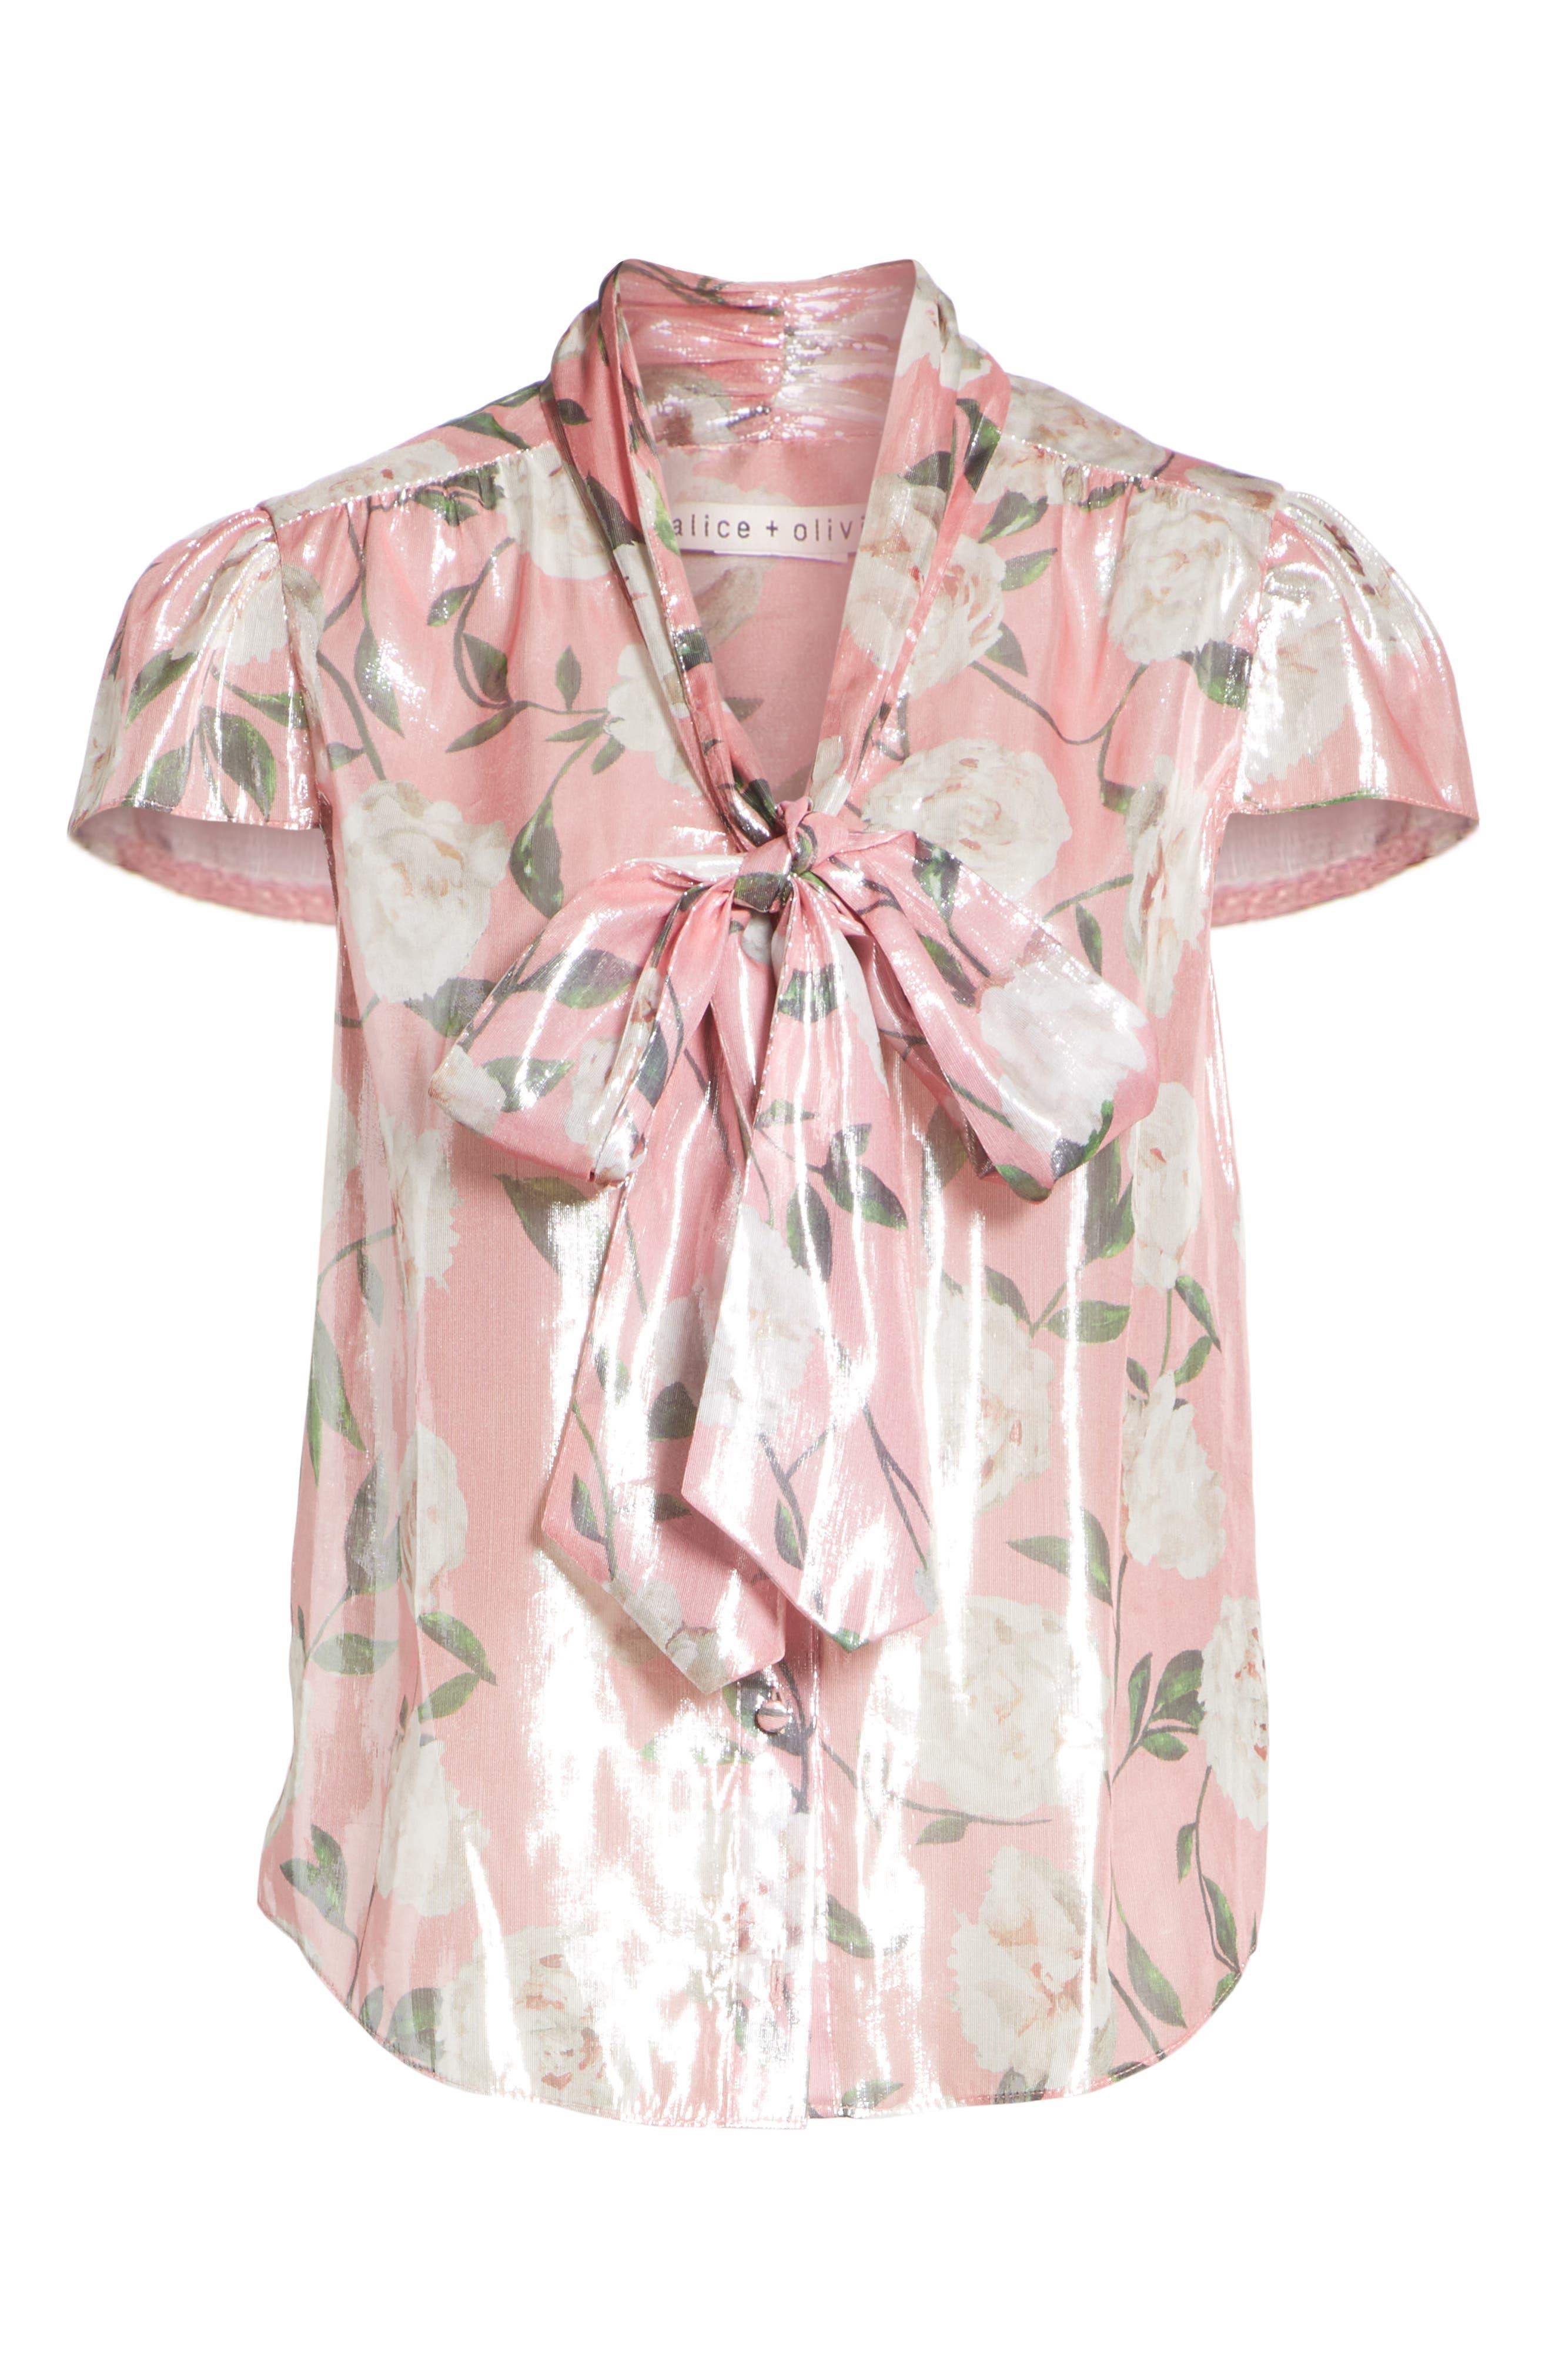 Jeannie Bow Collar Silk Blend Top,                             Alternate thumbnail 6, color,                             Peony Garden Wall/ Bubblegum